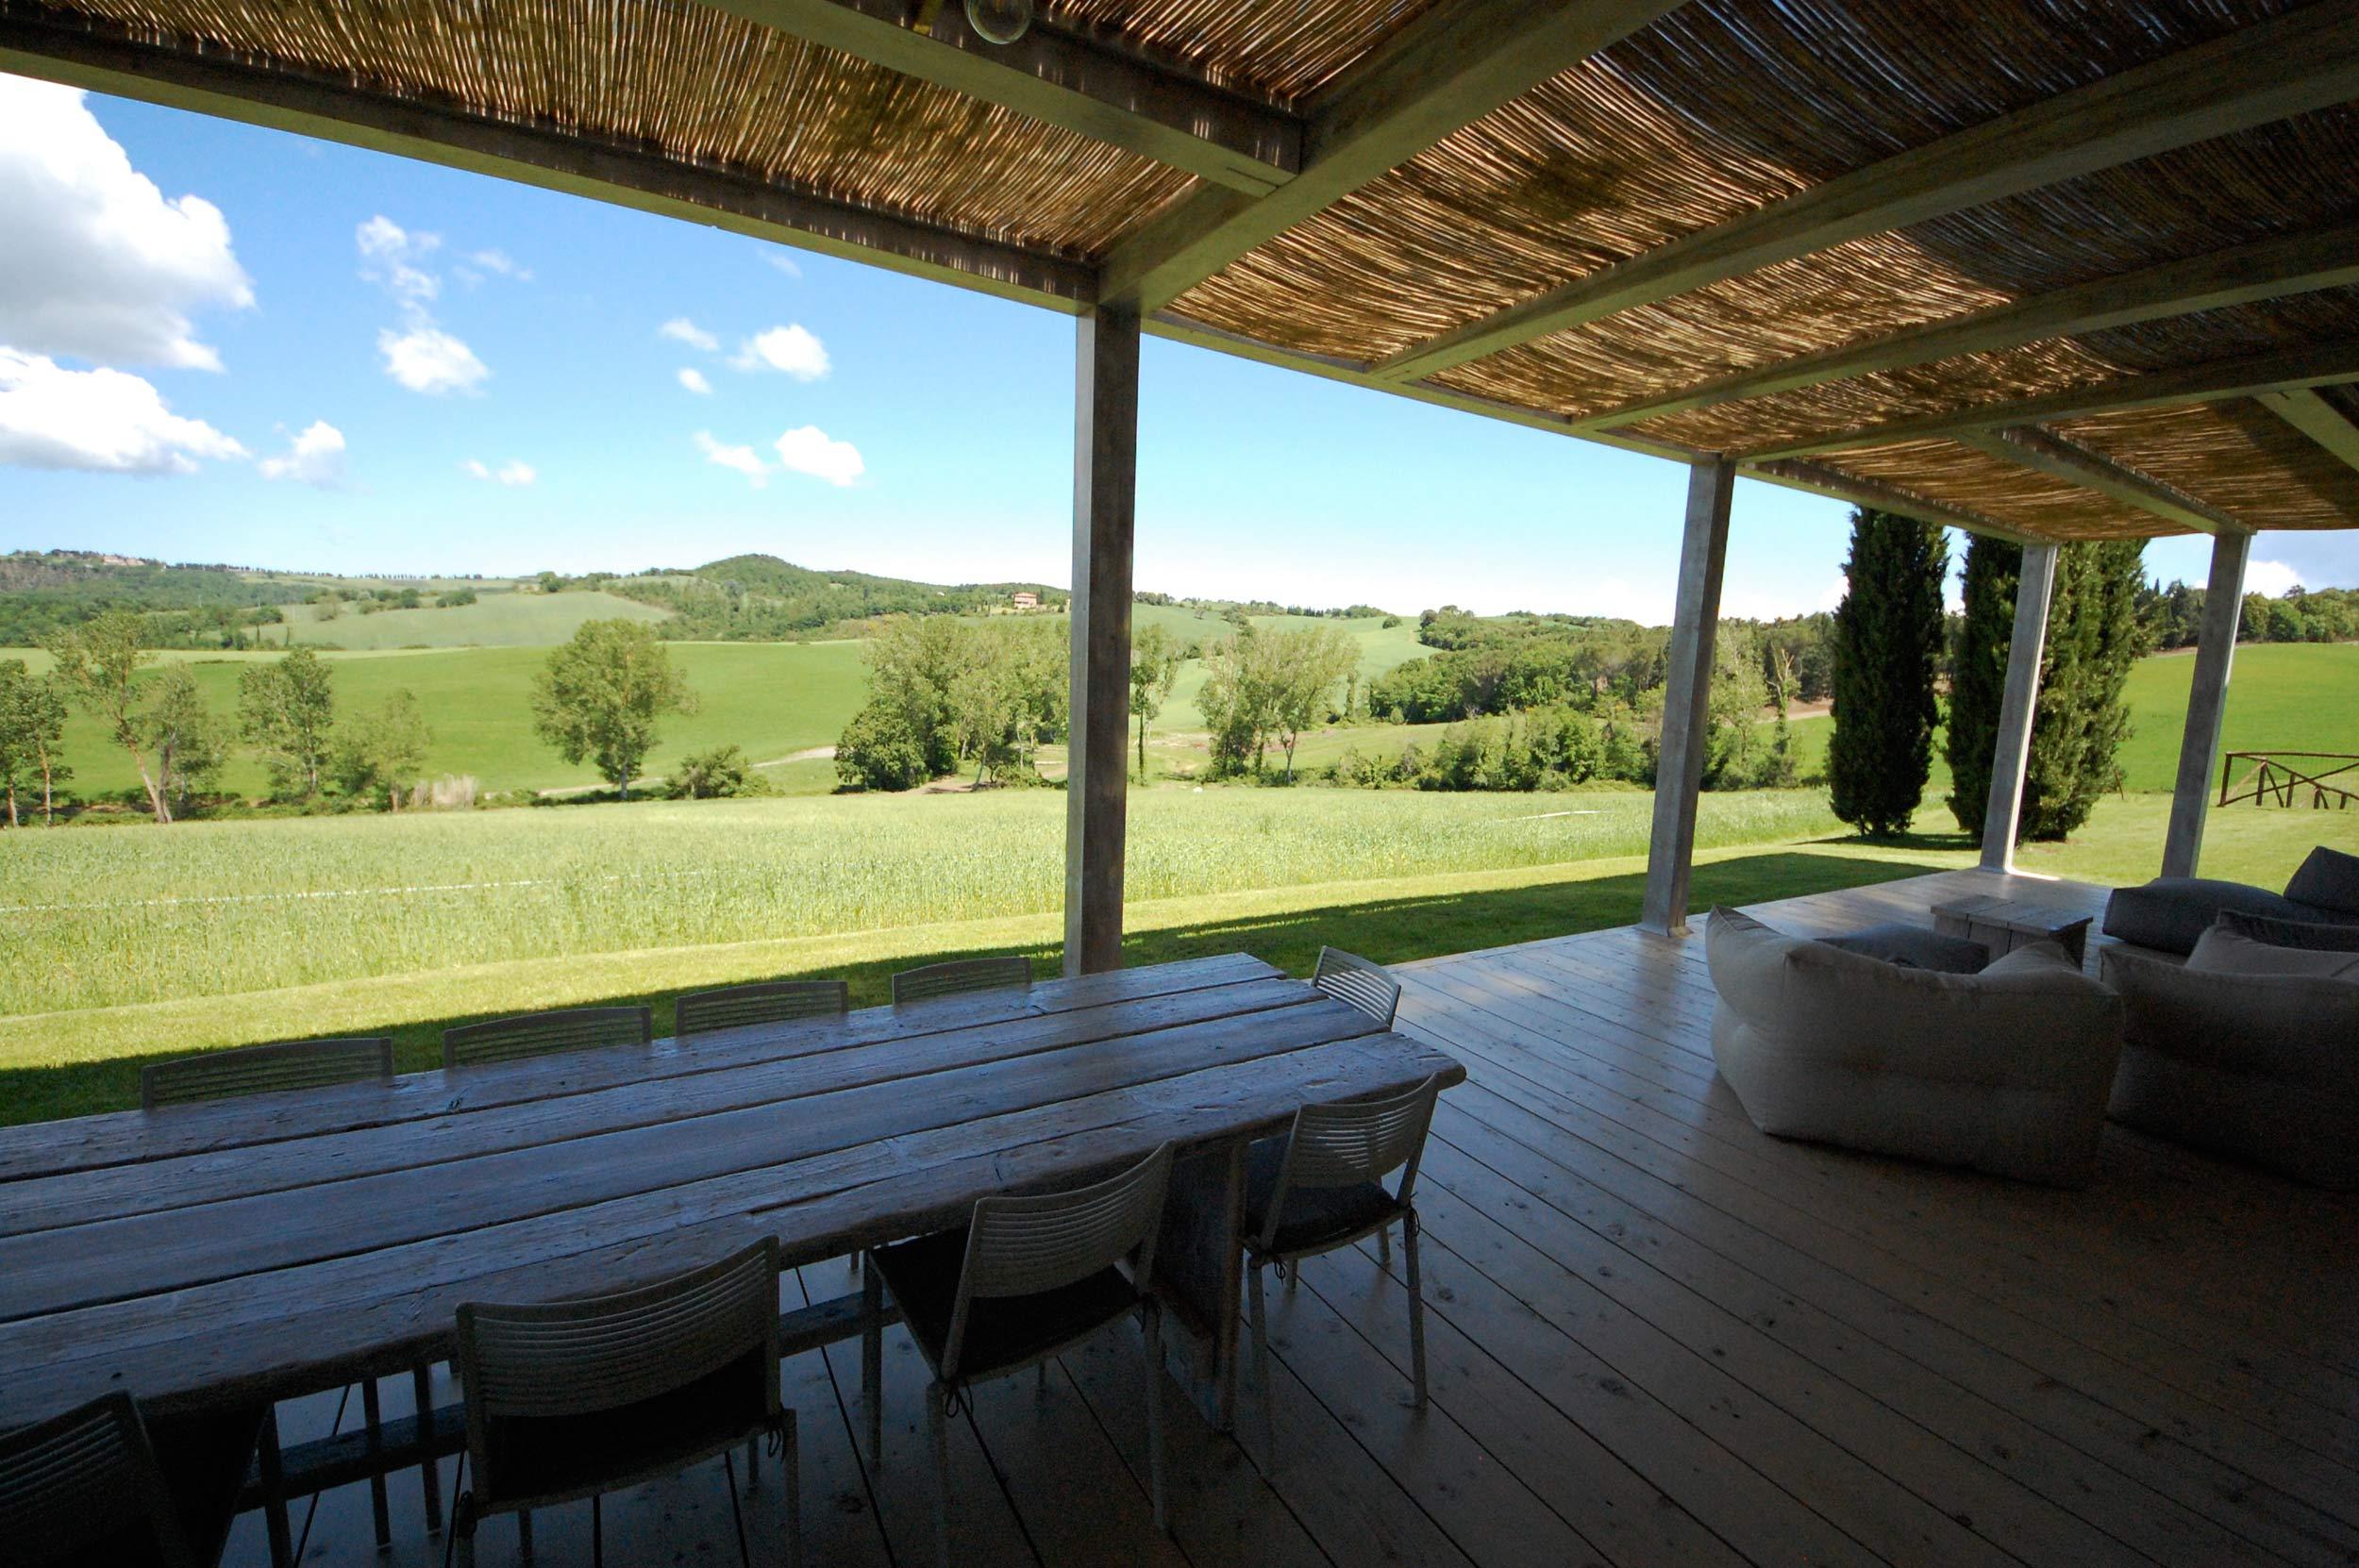 Pergola Villa Toscana Panoramica